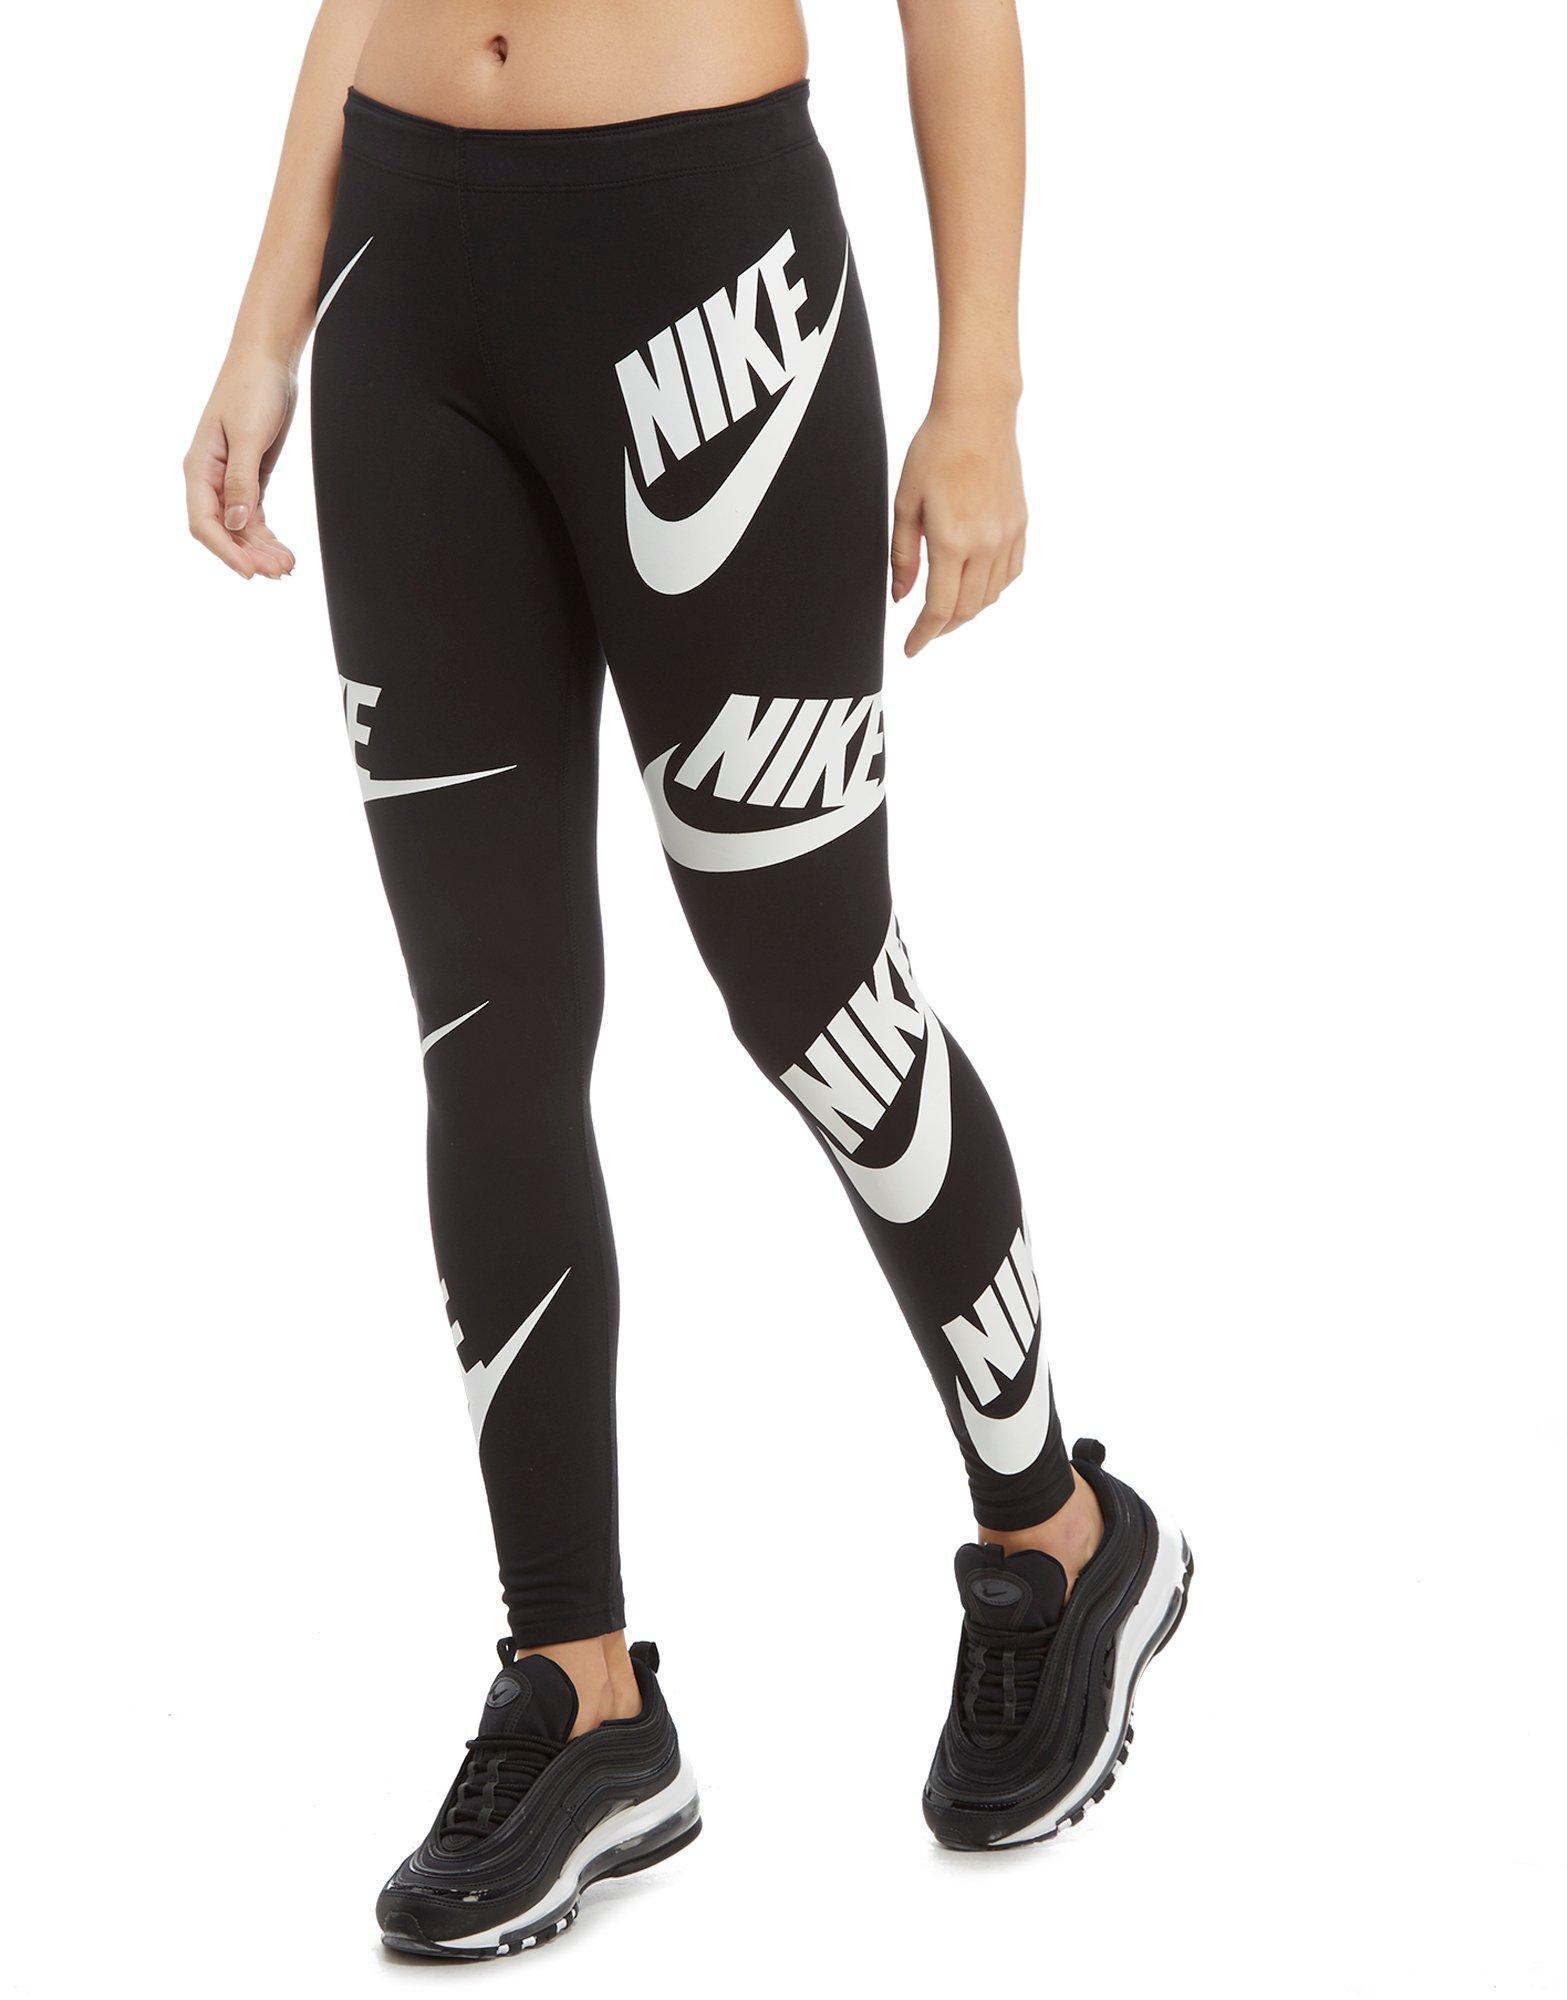 6eb445cff68eb Nike All Over Print Futura Leggings in Black - Lyst